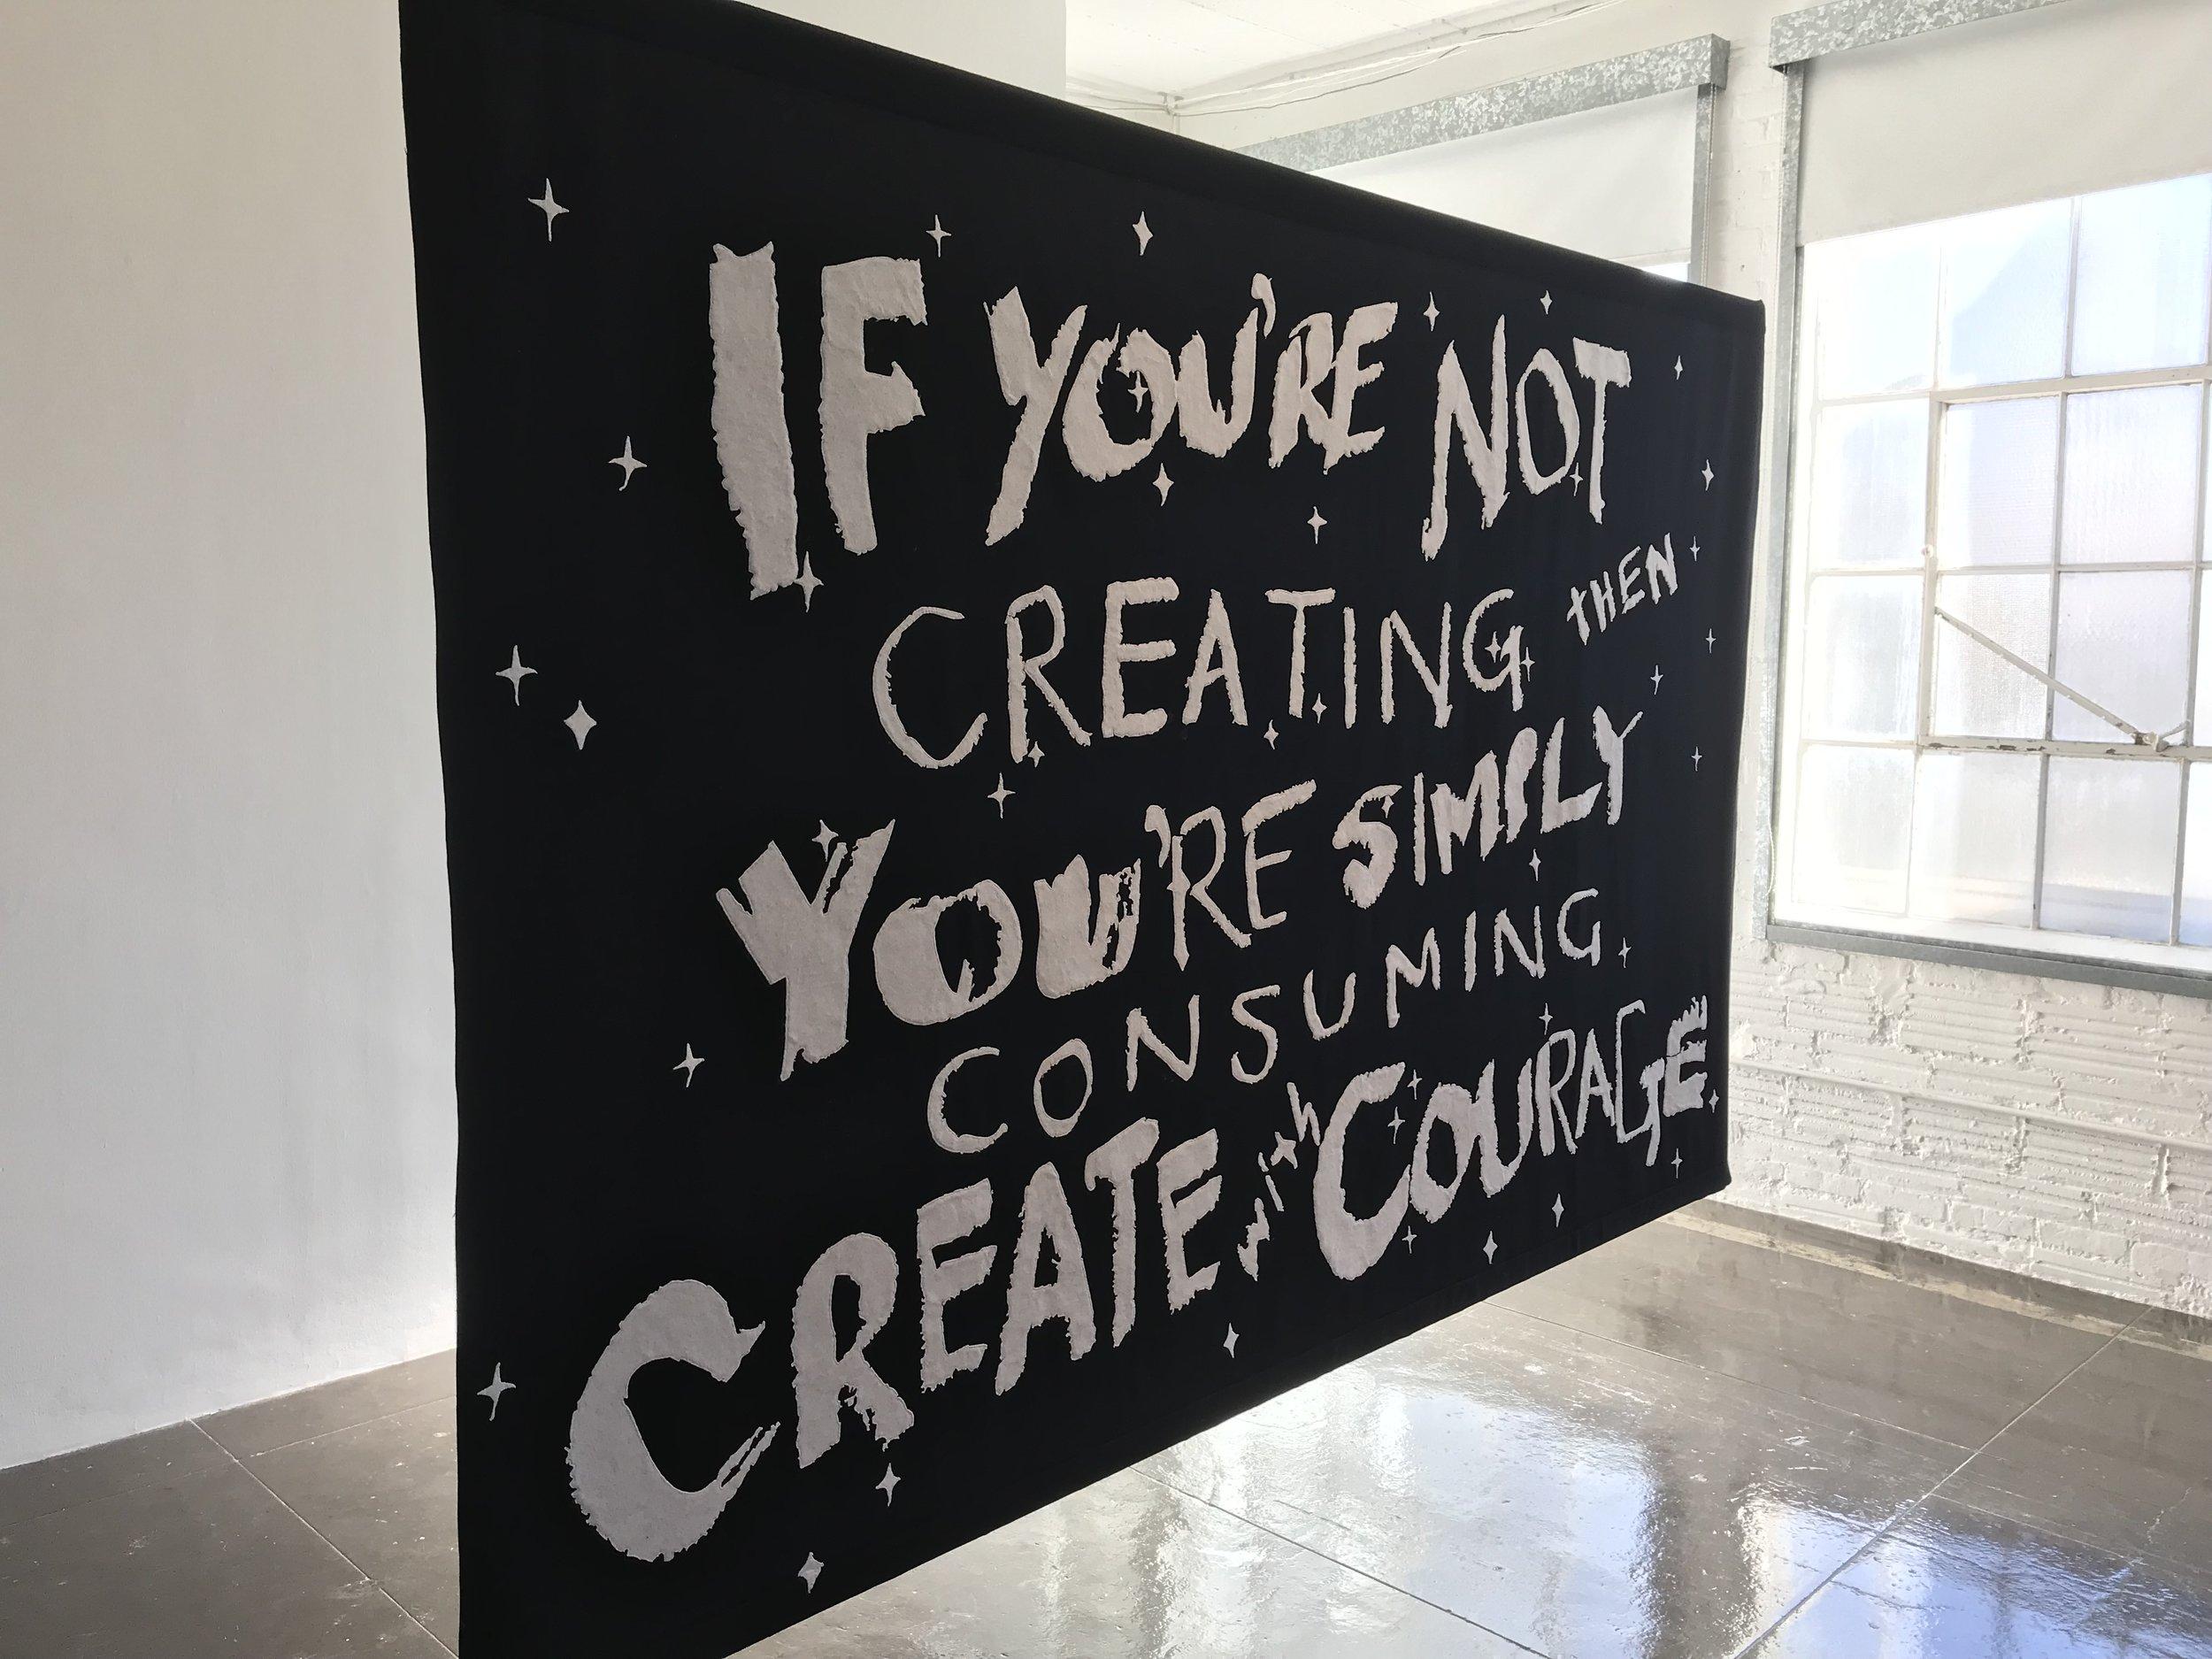 ArtPace exhibit in San Antonio Texas.